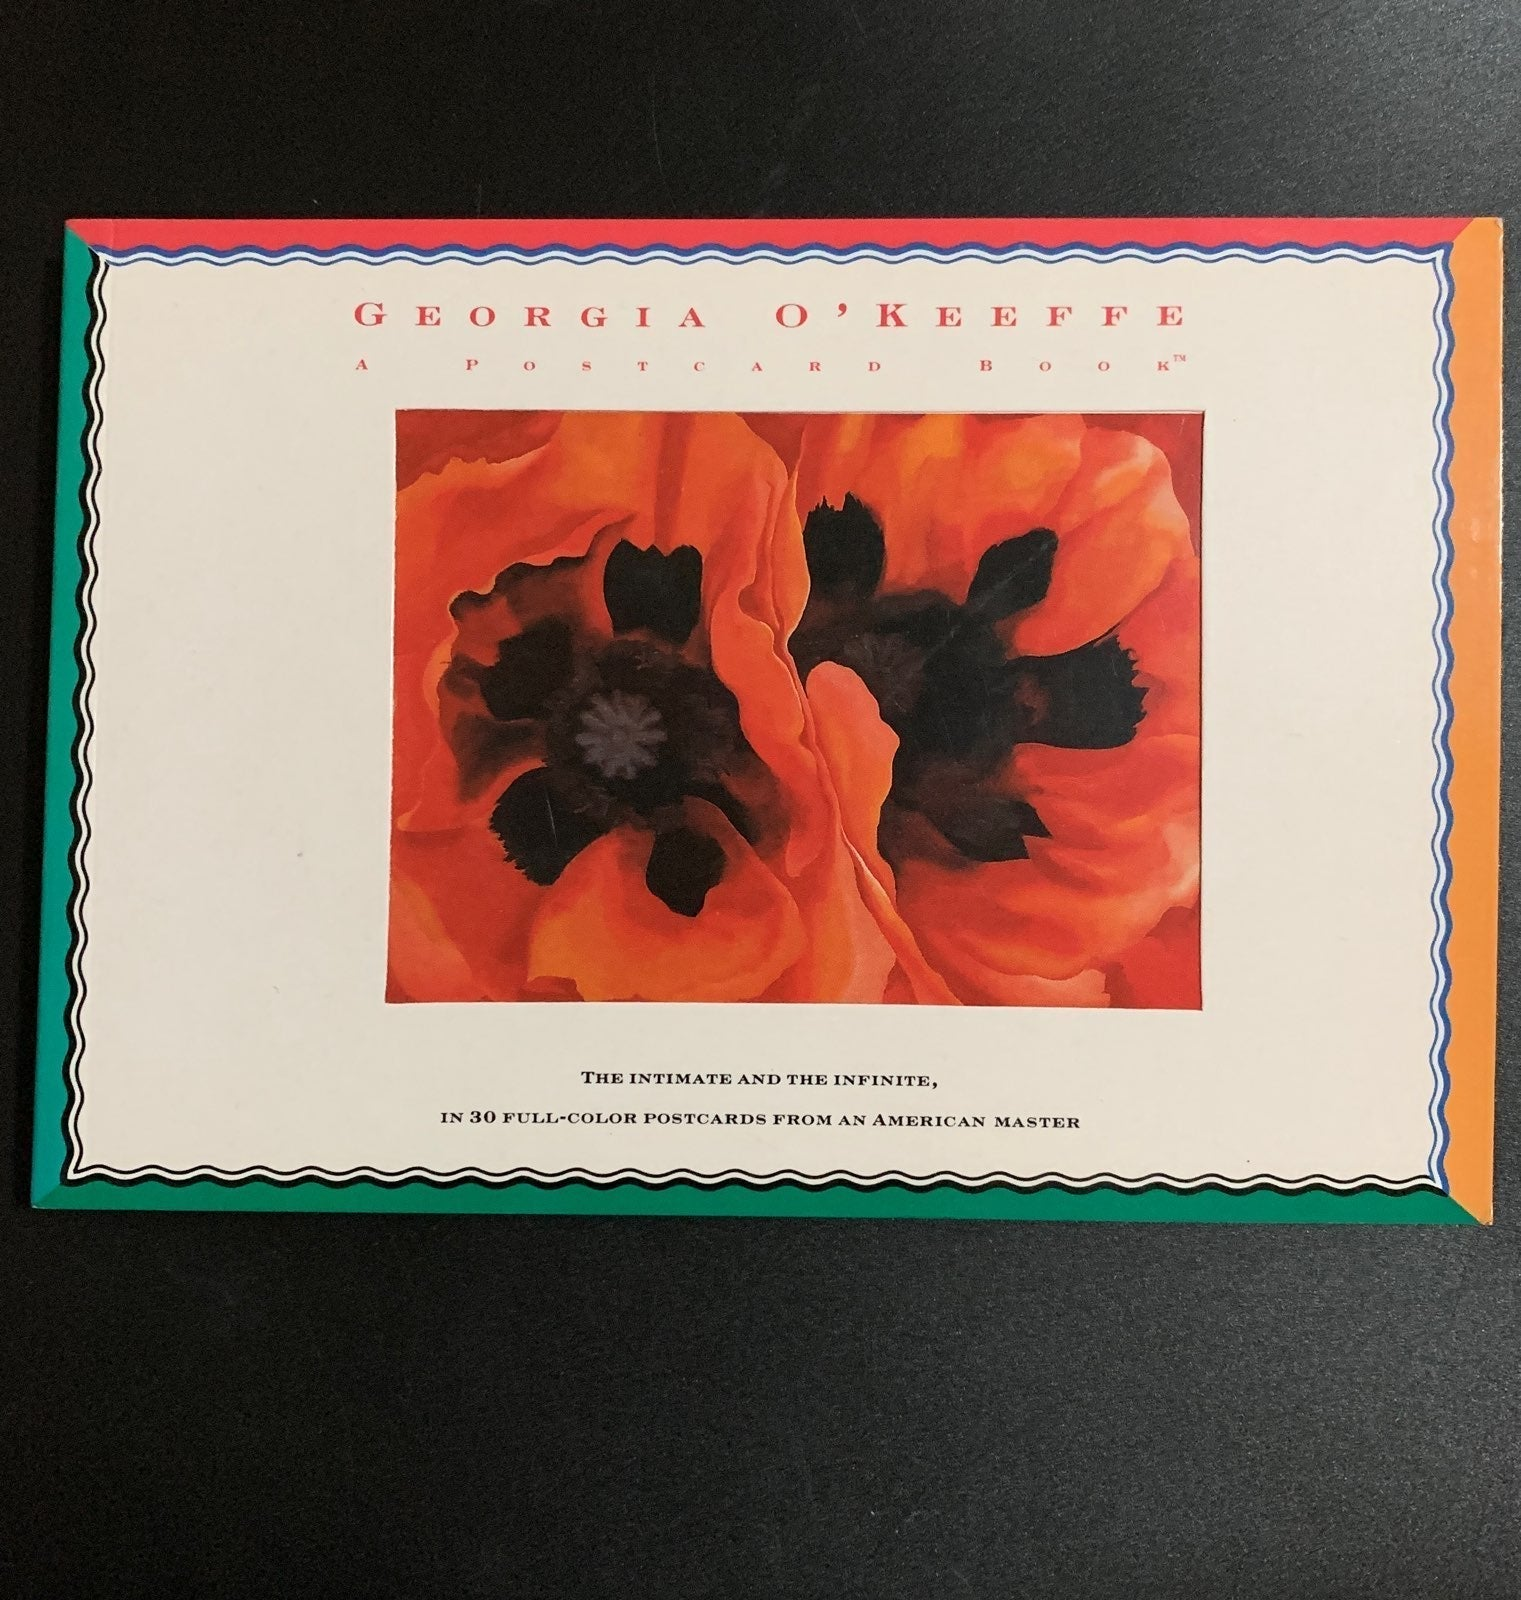 Georgia O'Keeffe A Postcard Book